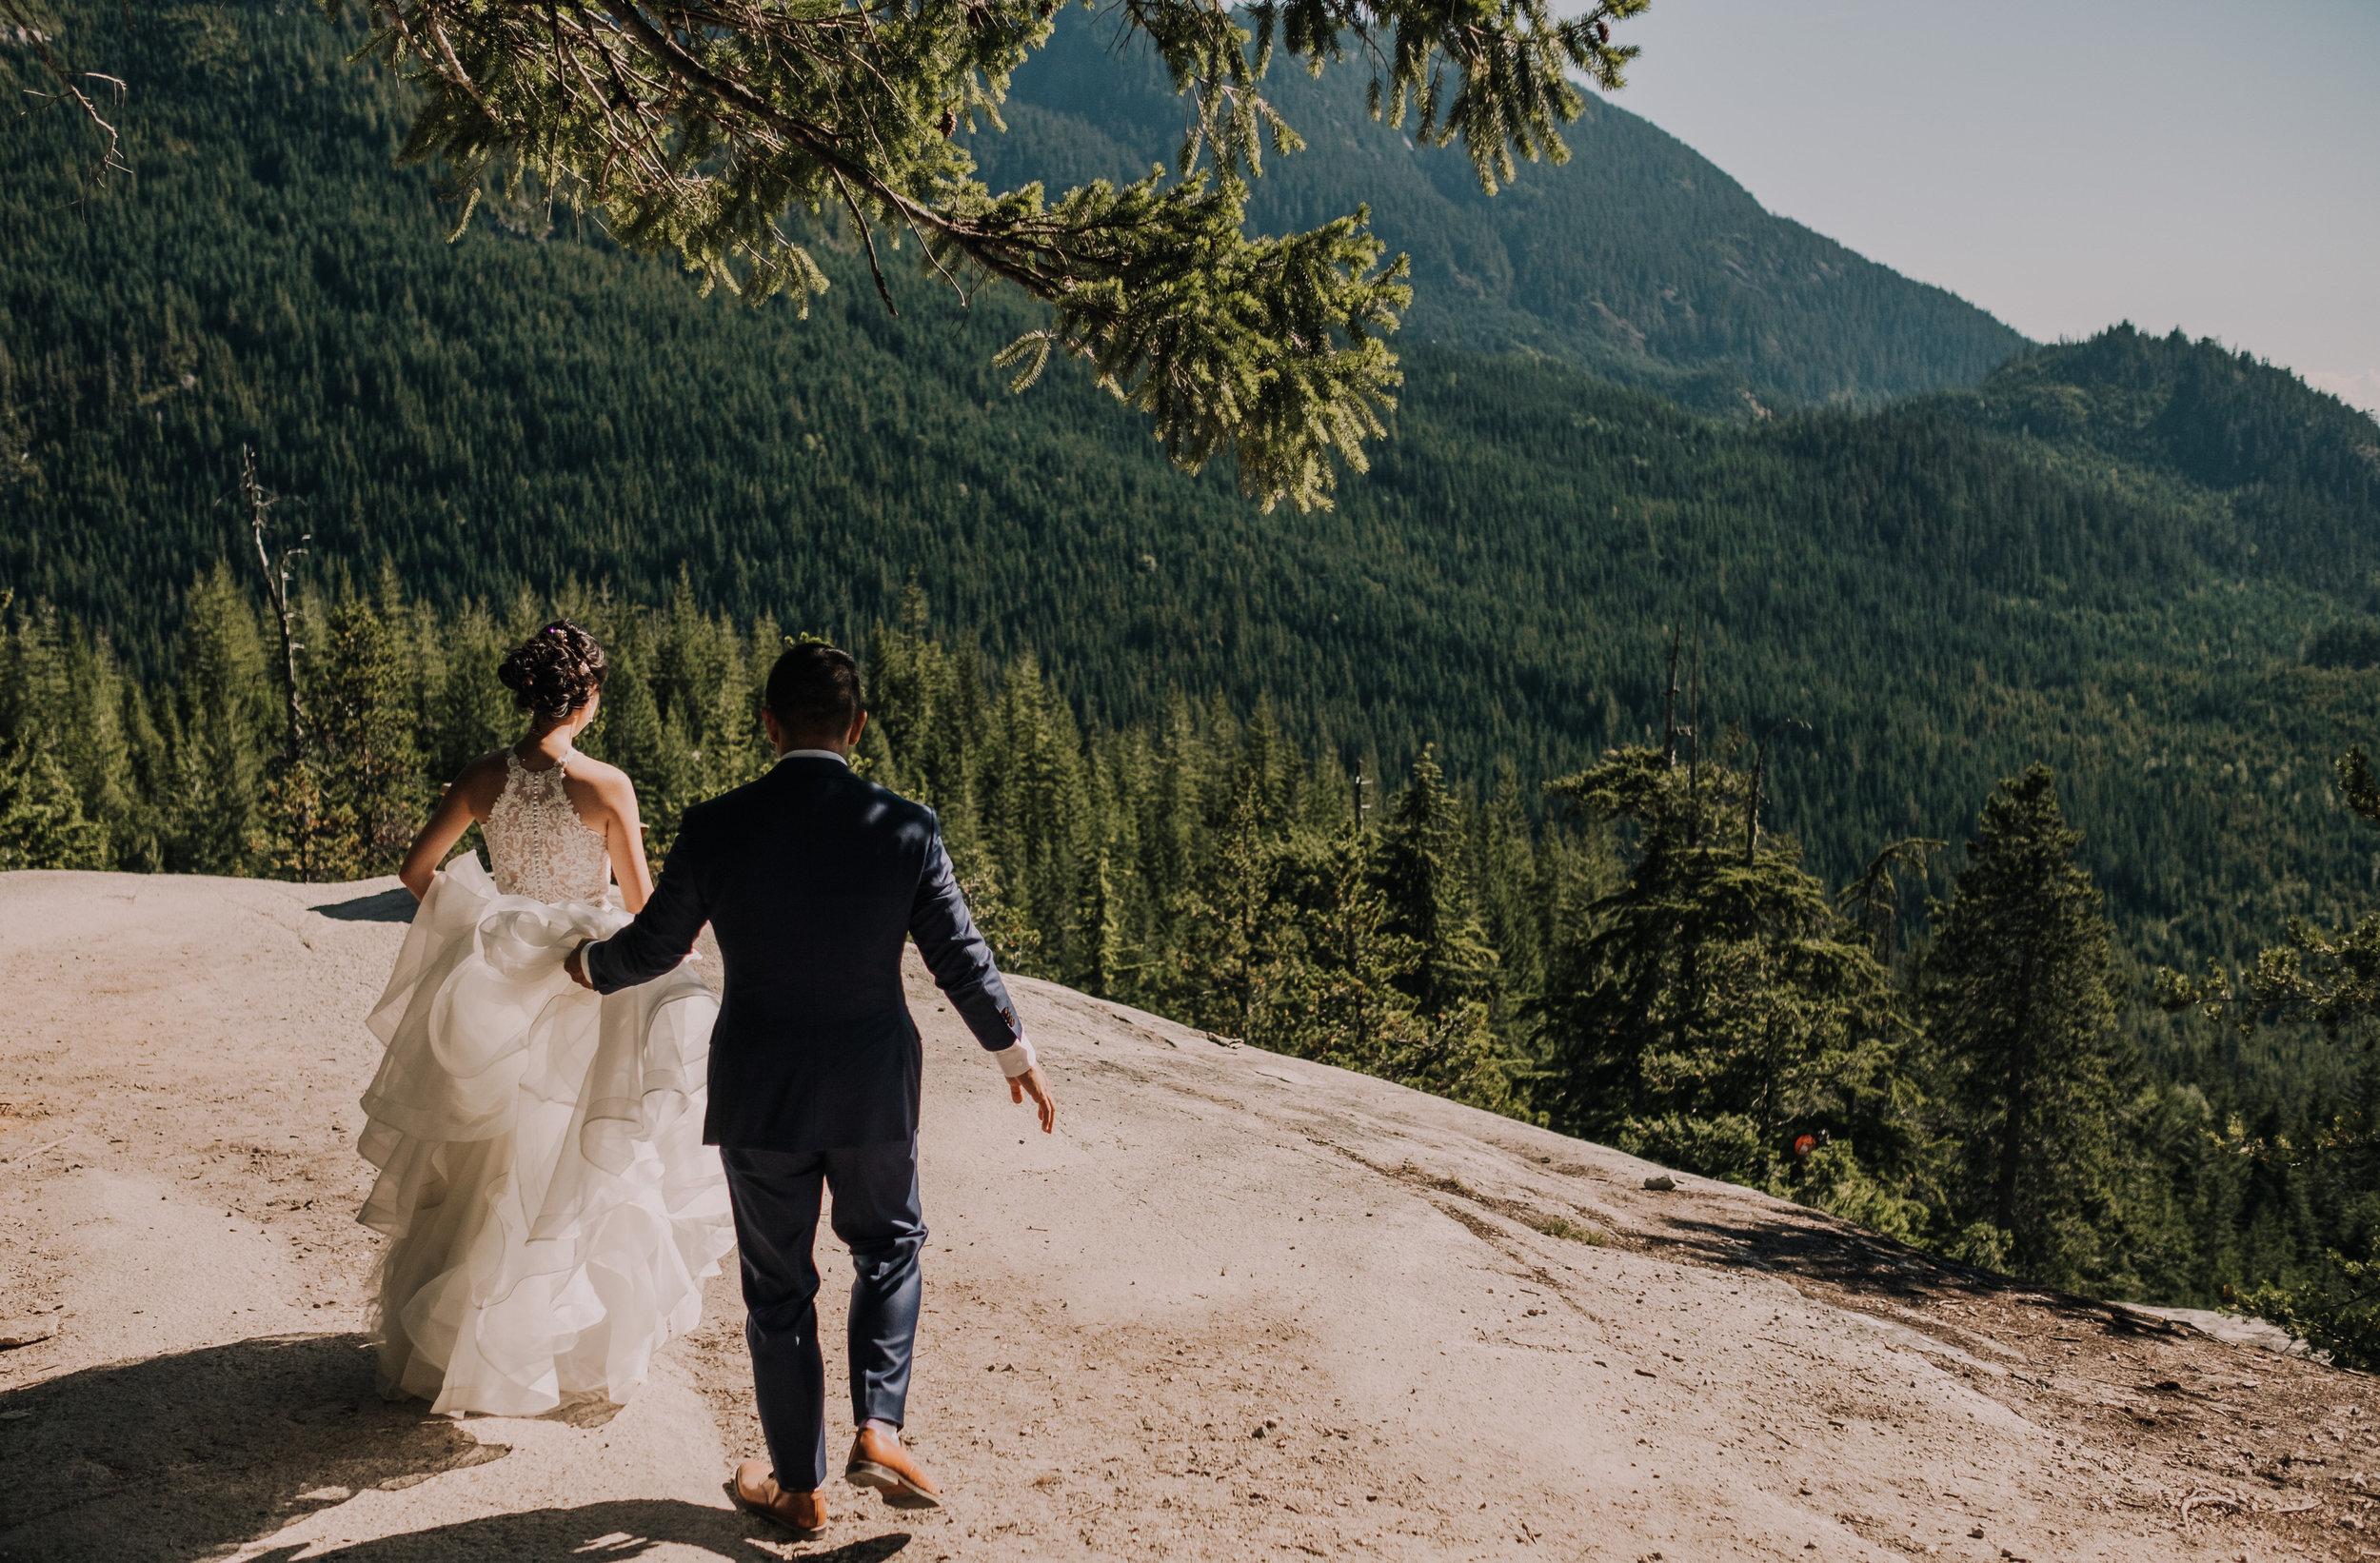 Squamish Wedding Photographer - Sea to Sky Gondola Wedding Photos -  Vancouver Wedding Photographer & Videographer - Sunshine Coast Wedding Photos - Sunshine Coast Wedding Photographer - Jennifer Picard Photography - DSCF7592.jpg